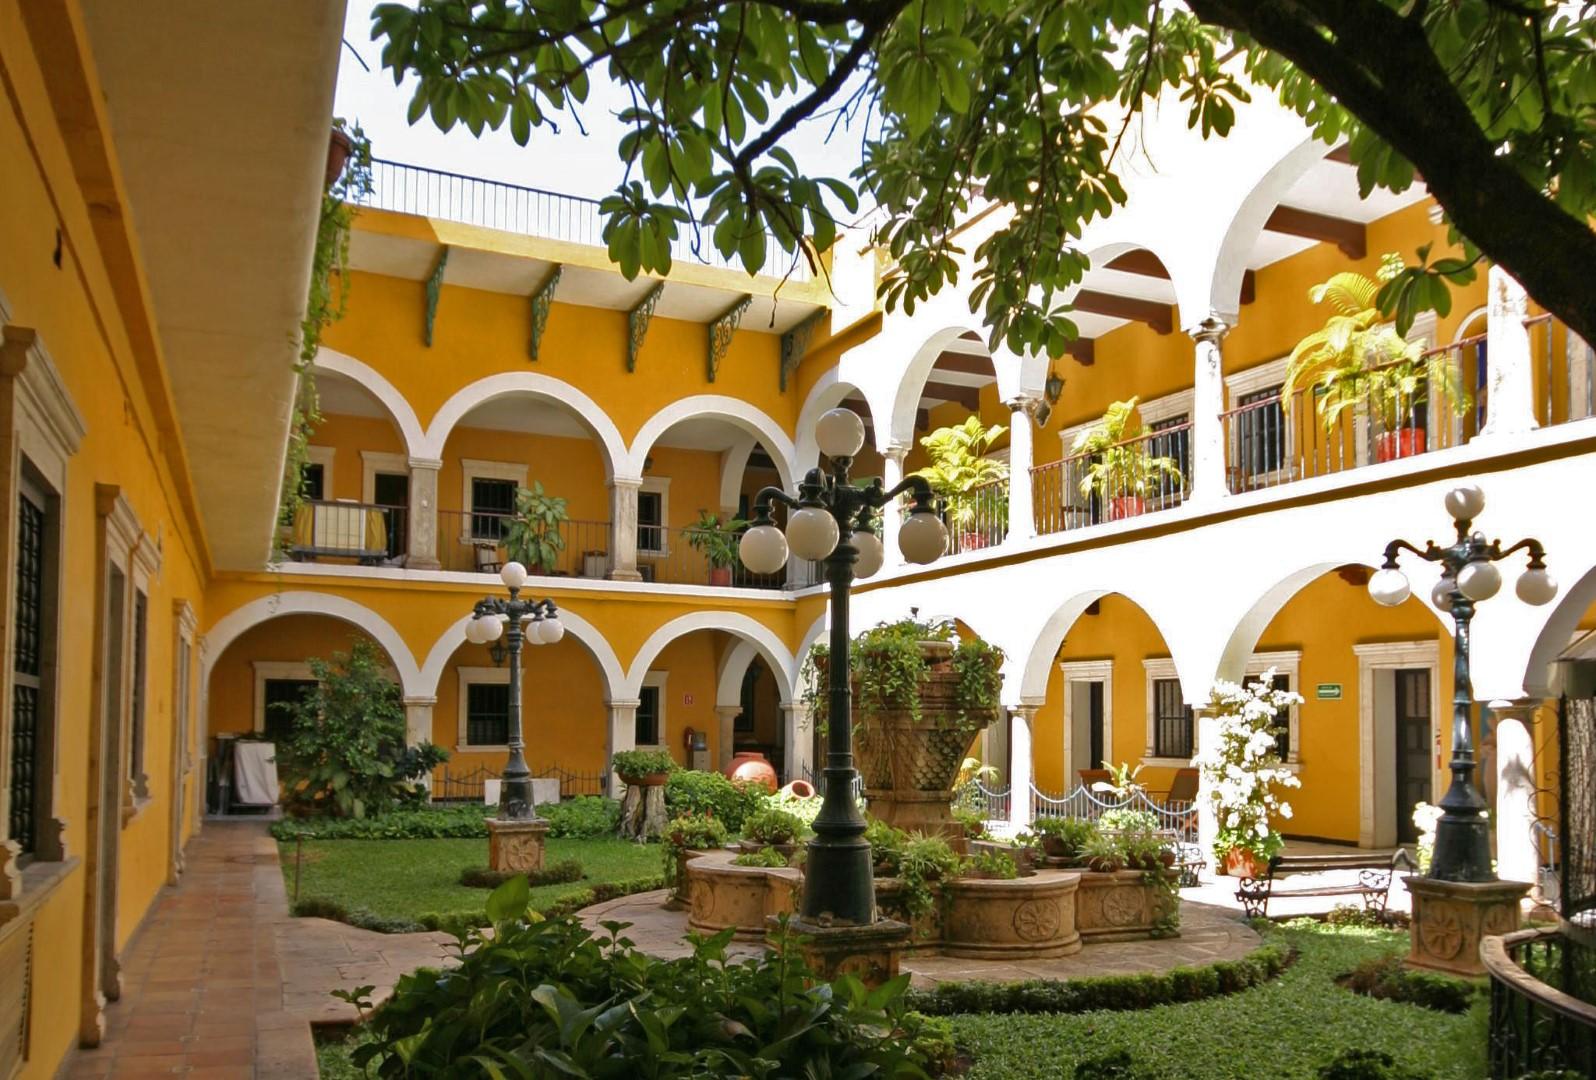 Courtyard at Hotel Caribe Merida